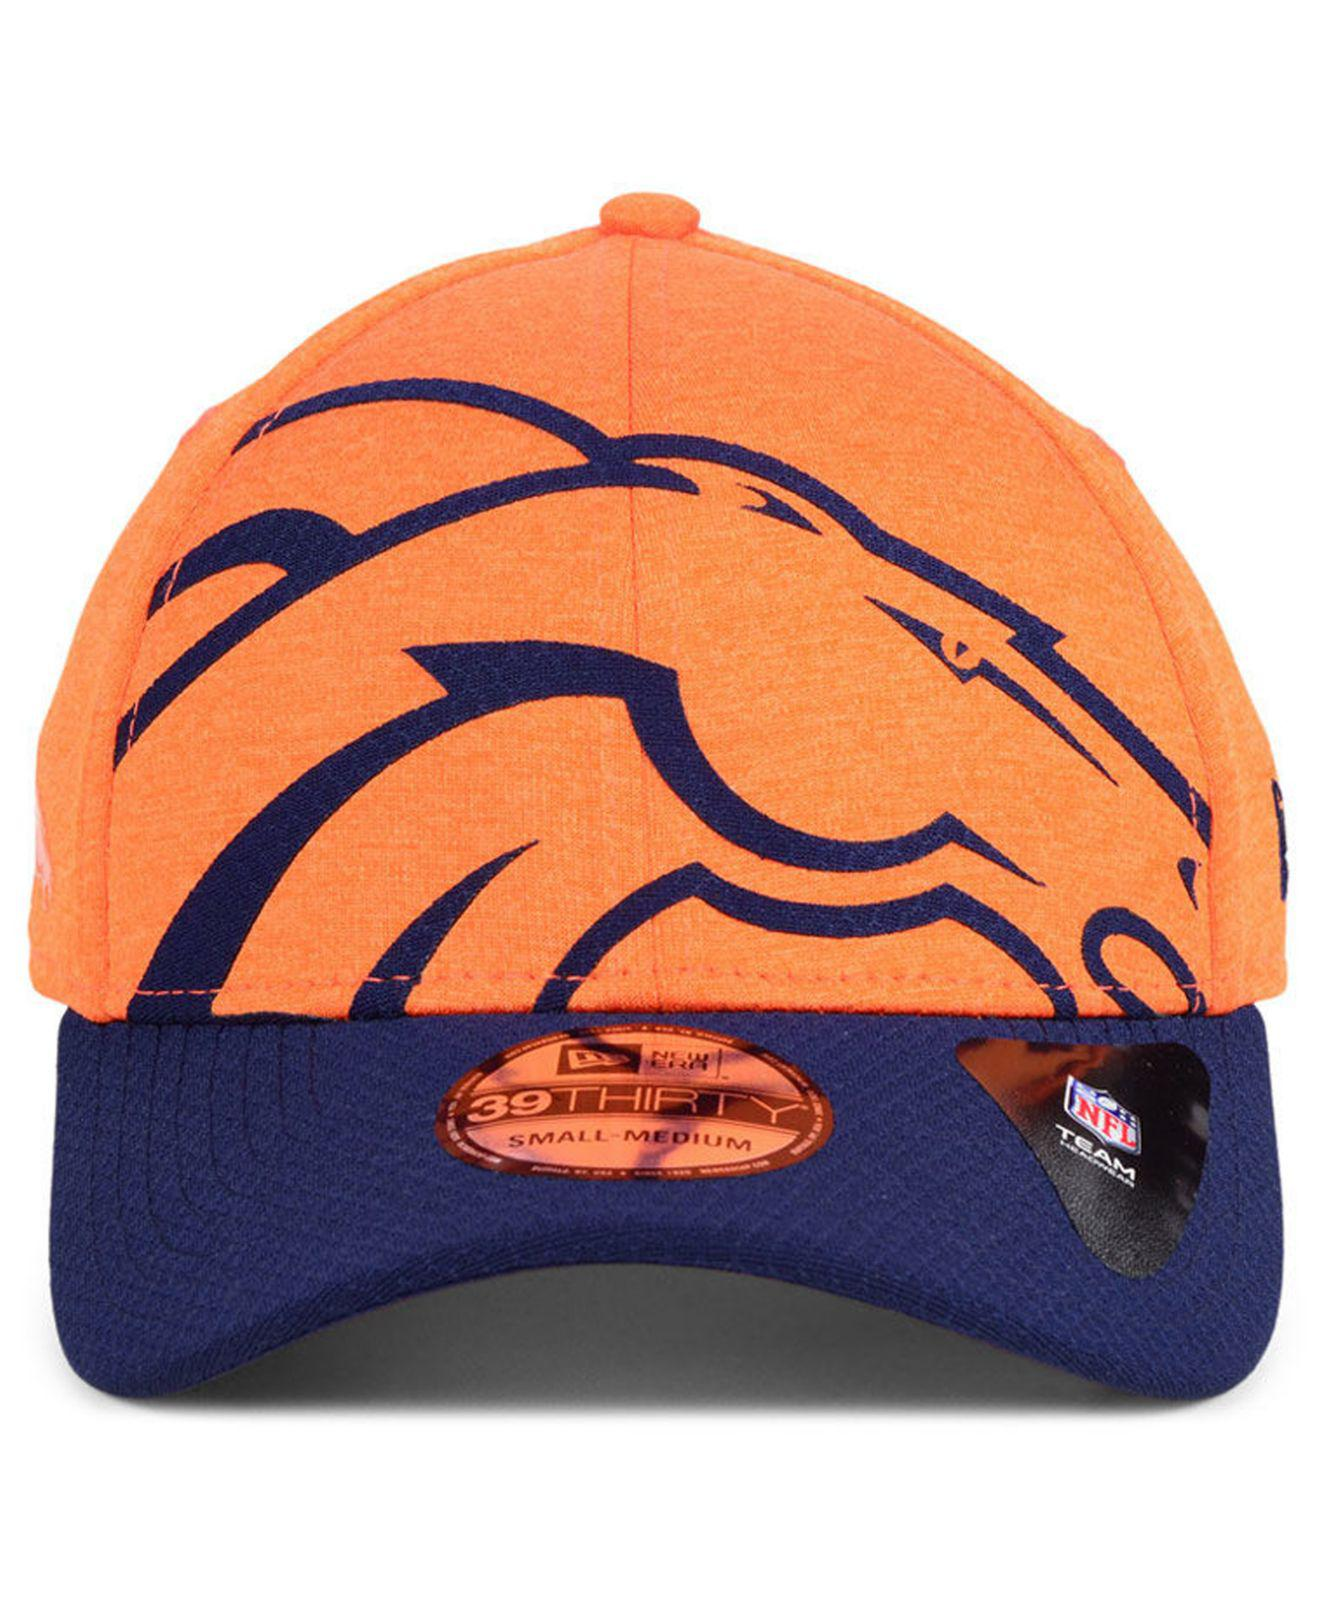 sale retailer f71ea 33a8d Lyst - KTZ Denver Broncos Oversized Laser Cut Logo 39thirty Cap in Orange  for Men